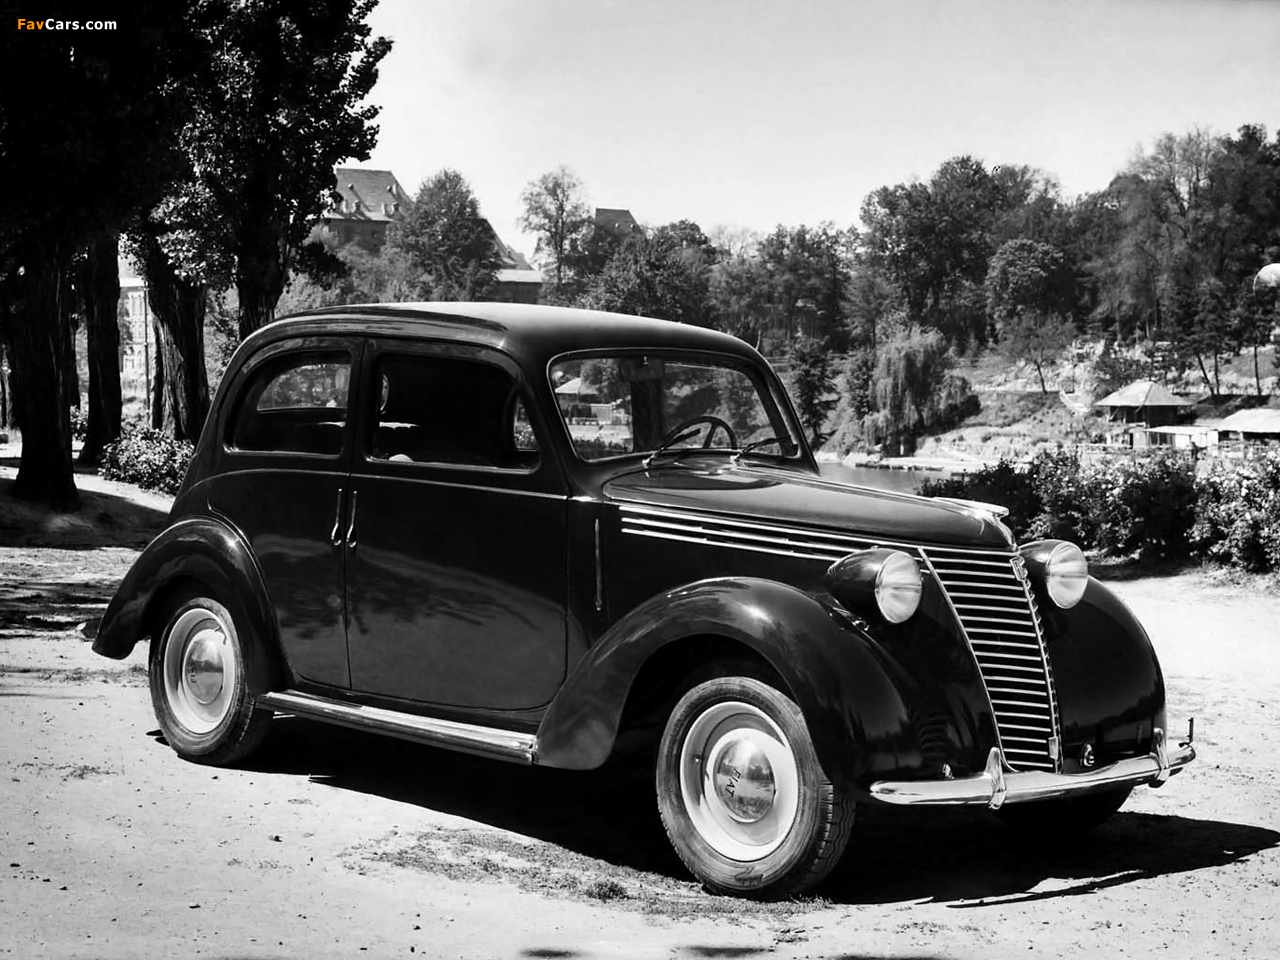 Photos Of Fiat 1100 B 1948 49 1280x960